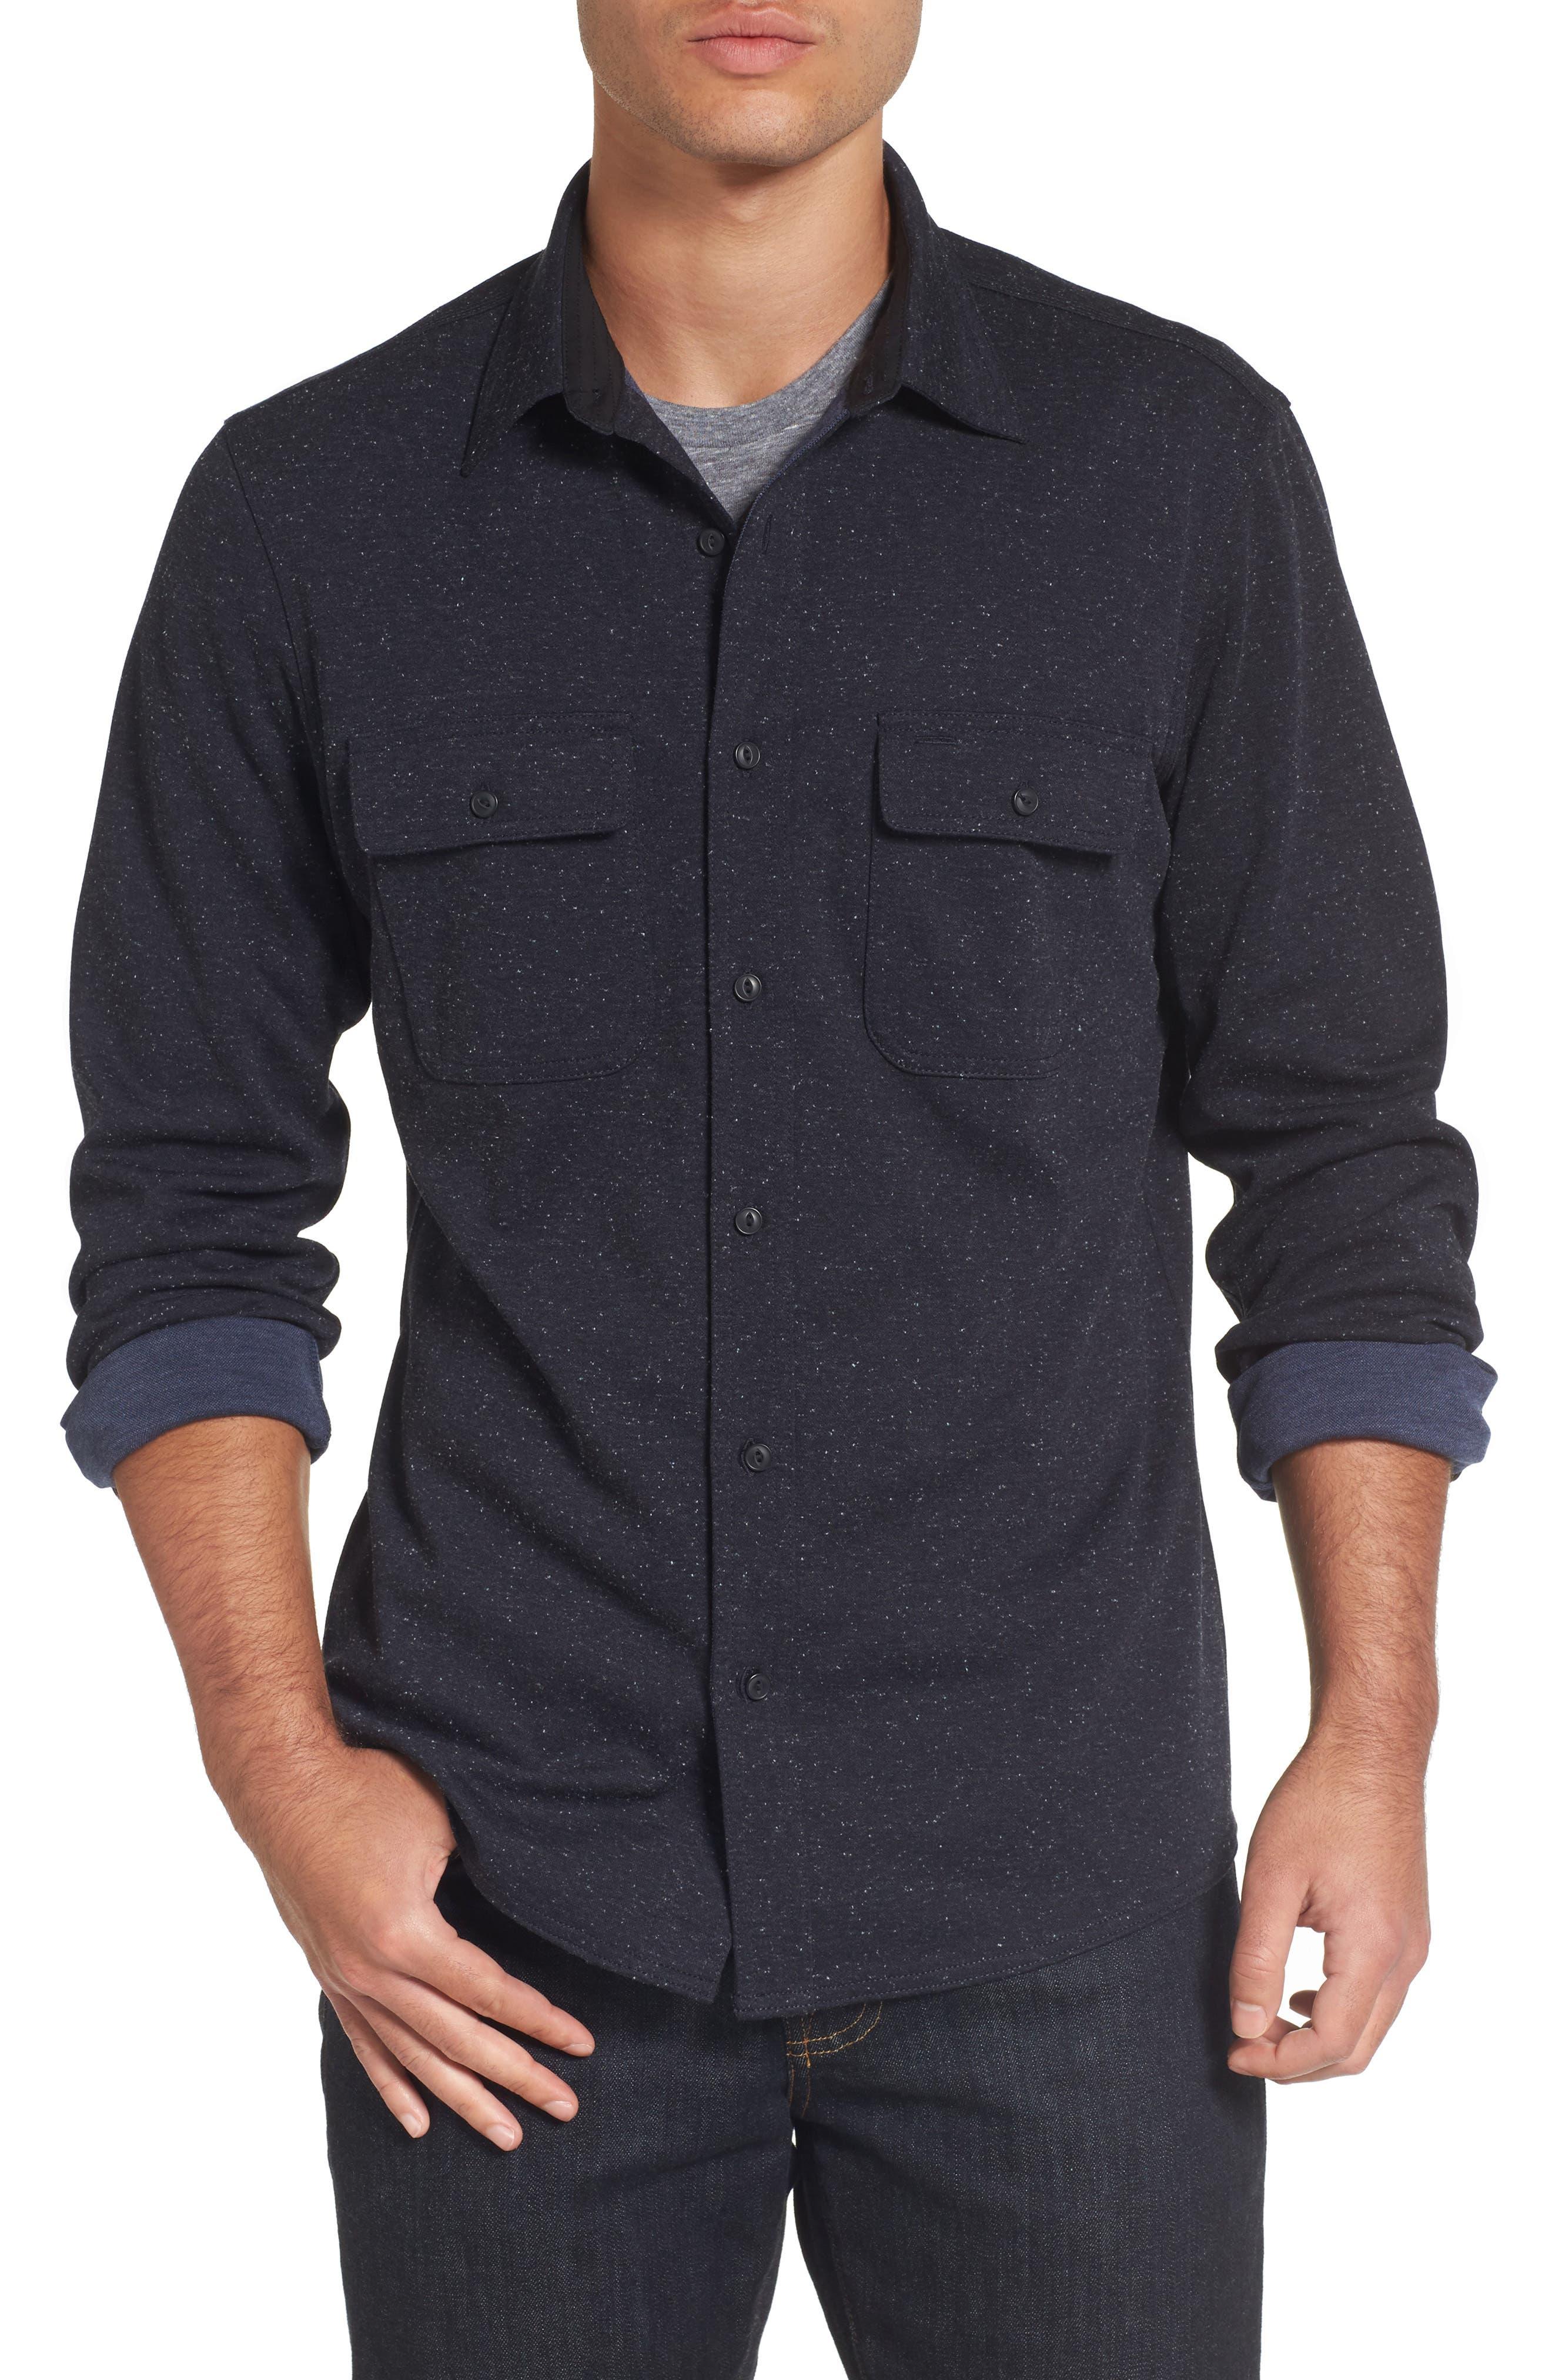 Nordstrom Men's Shop Knit Sport Shirt